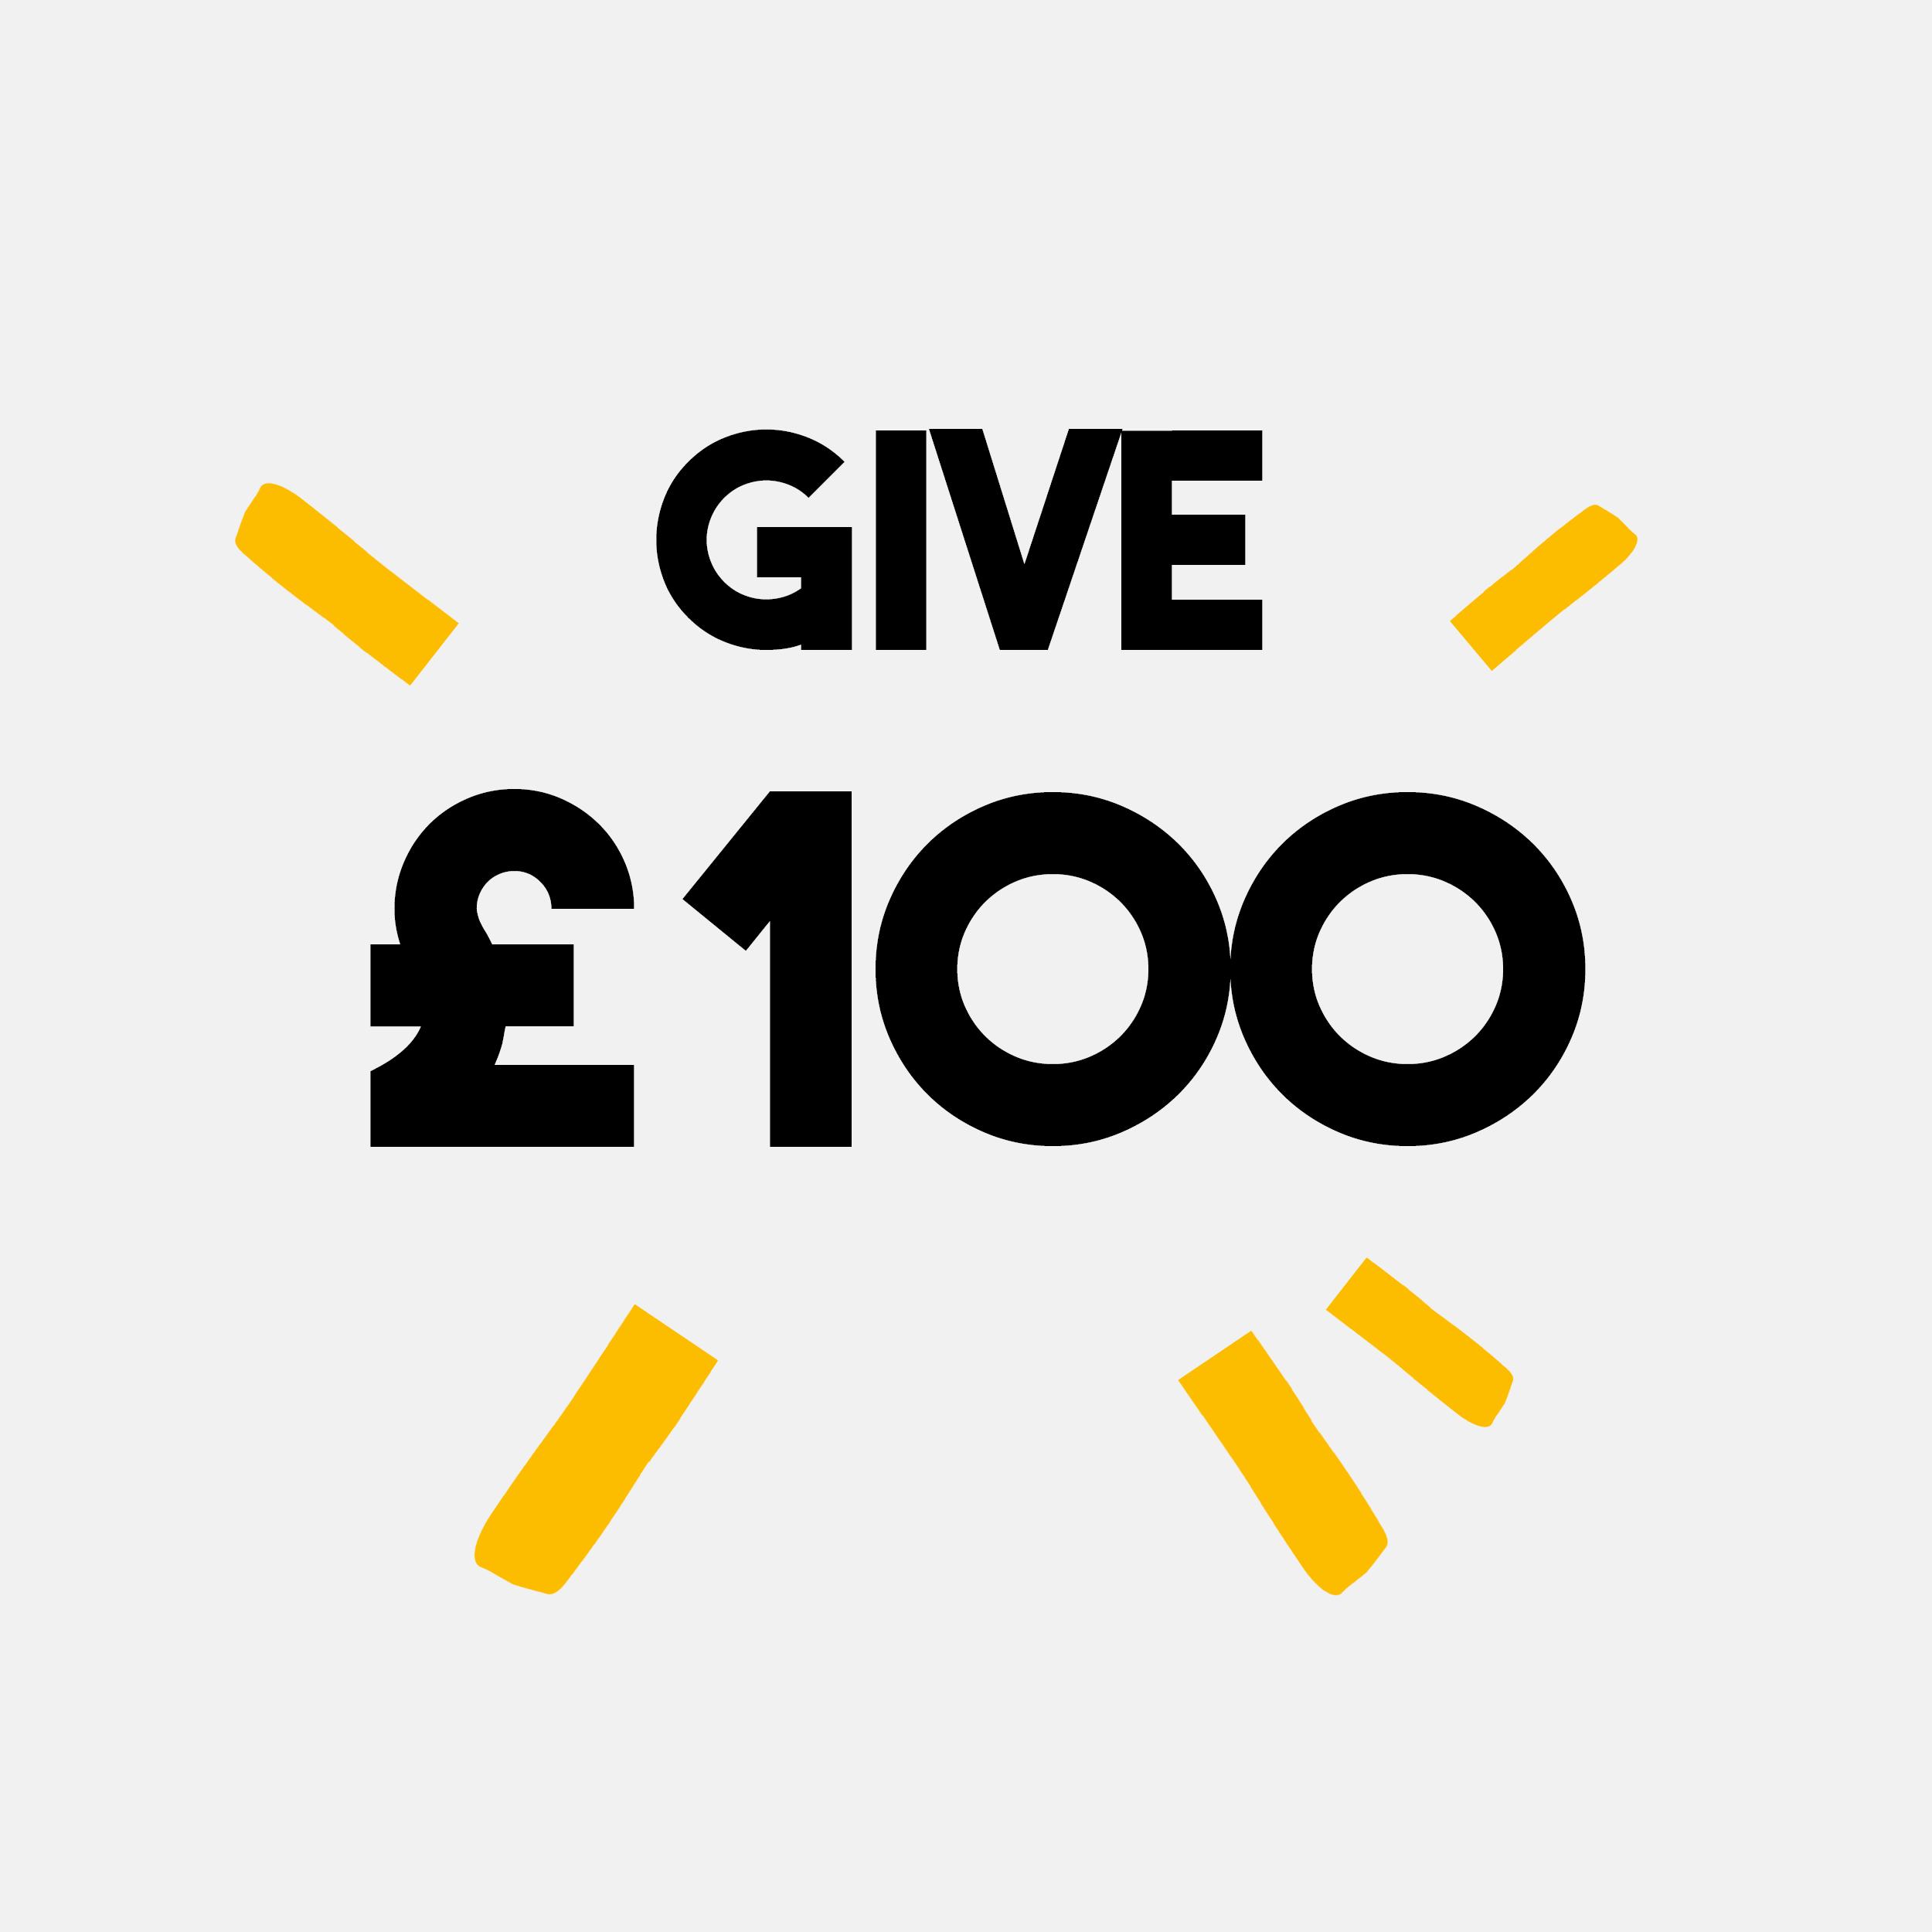 £100 pays for SSP representation at arts festivals such as Edinburgh Festival Fringe.